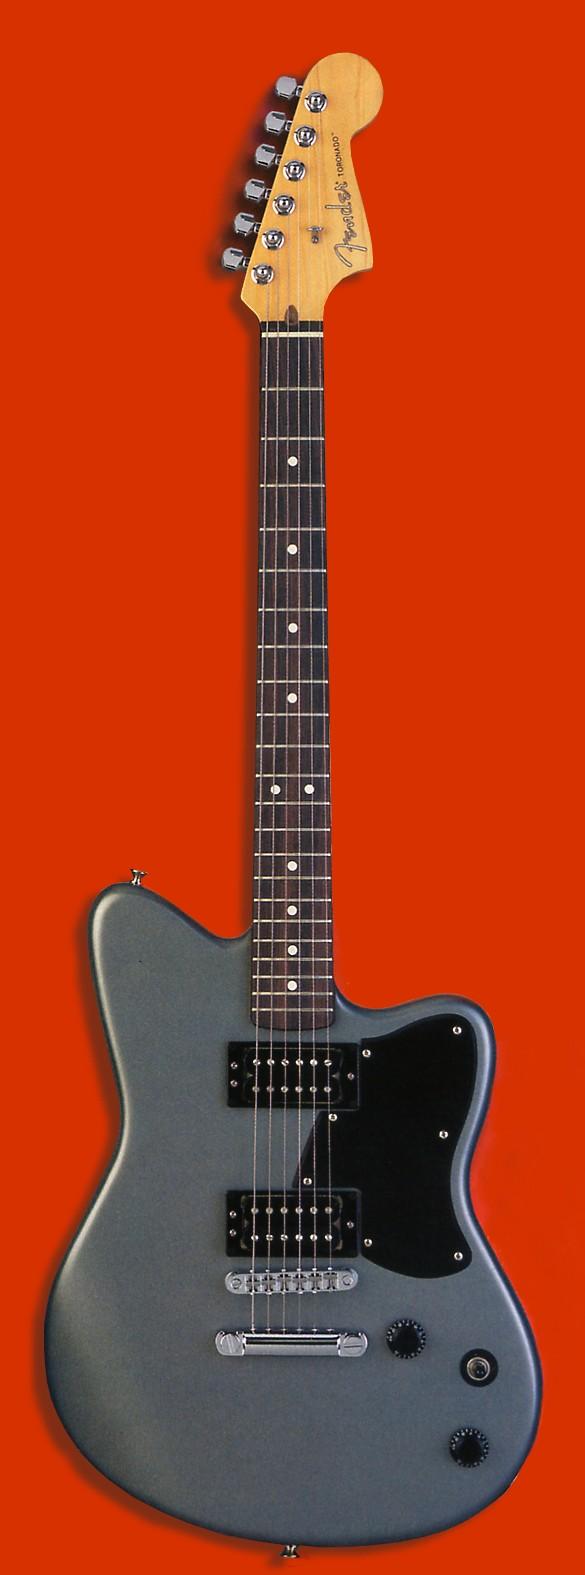 Fender toronado wikiwand sciox Choice Image